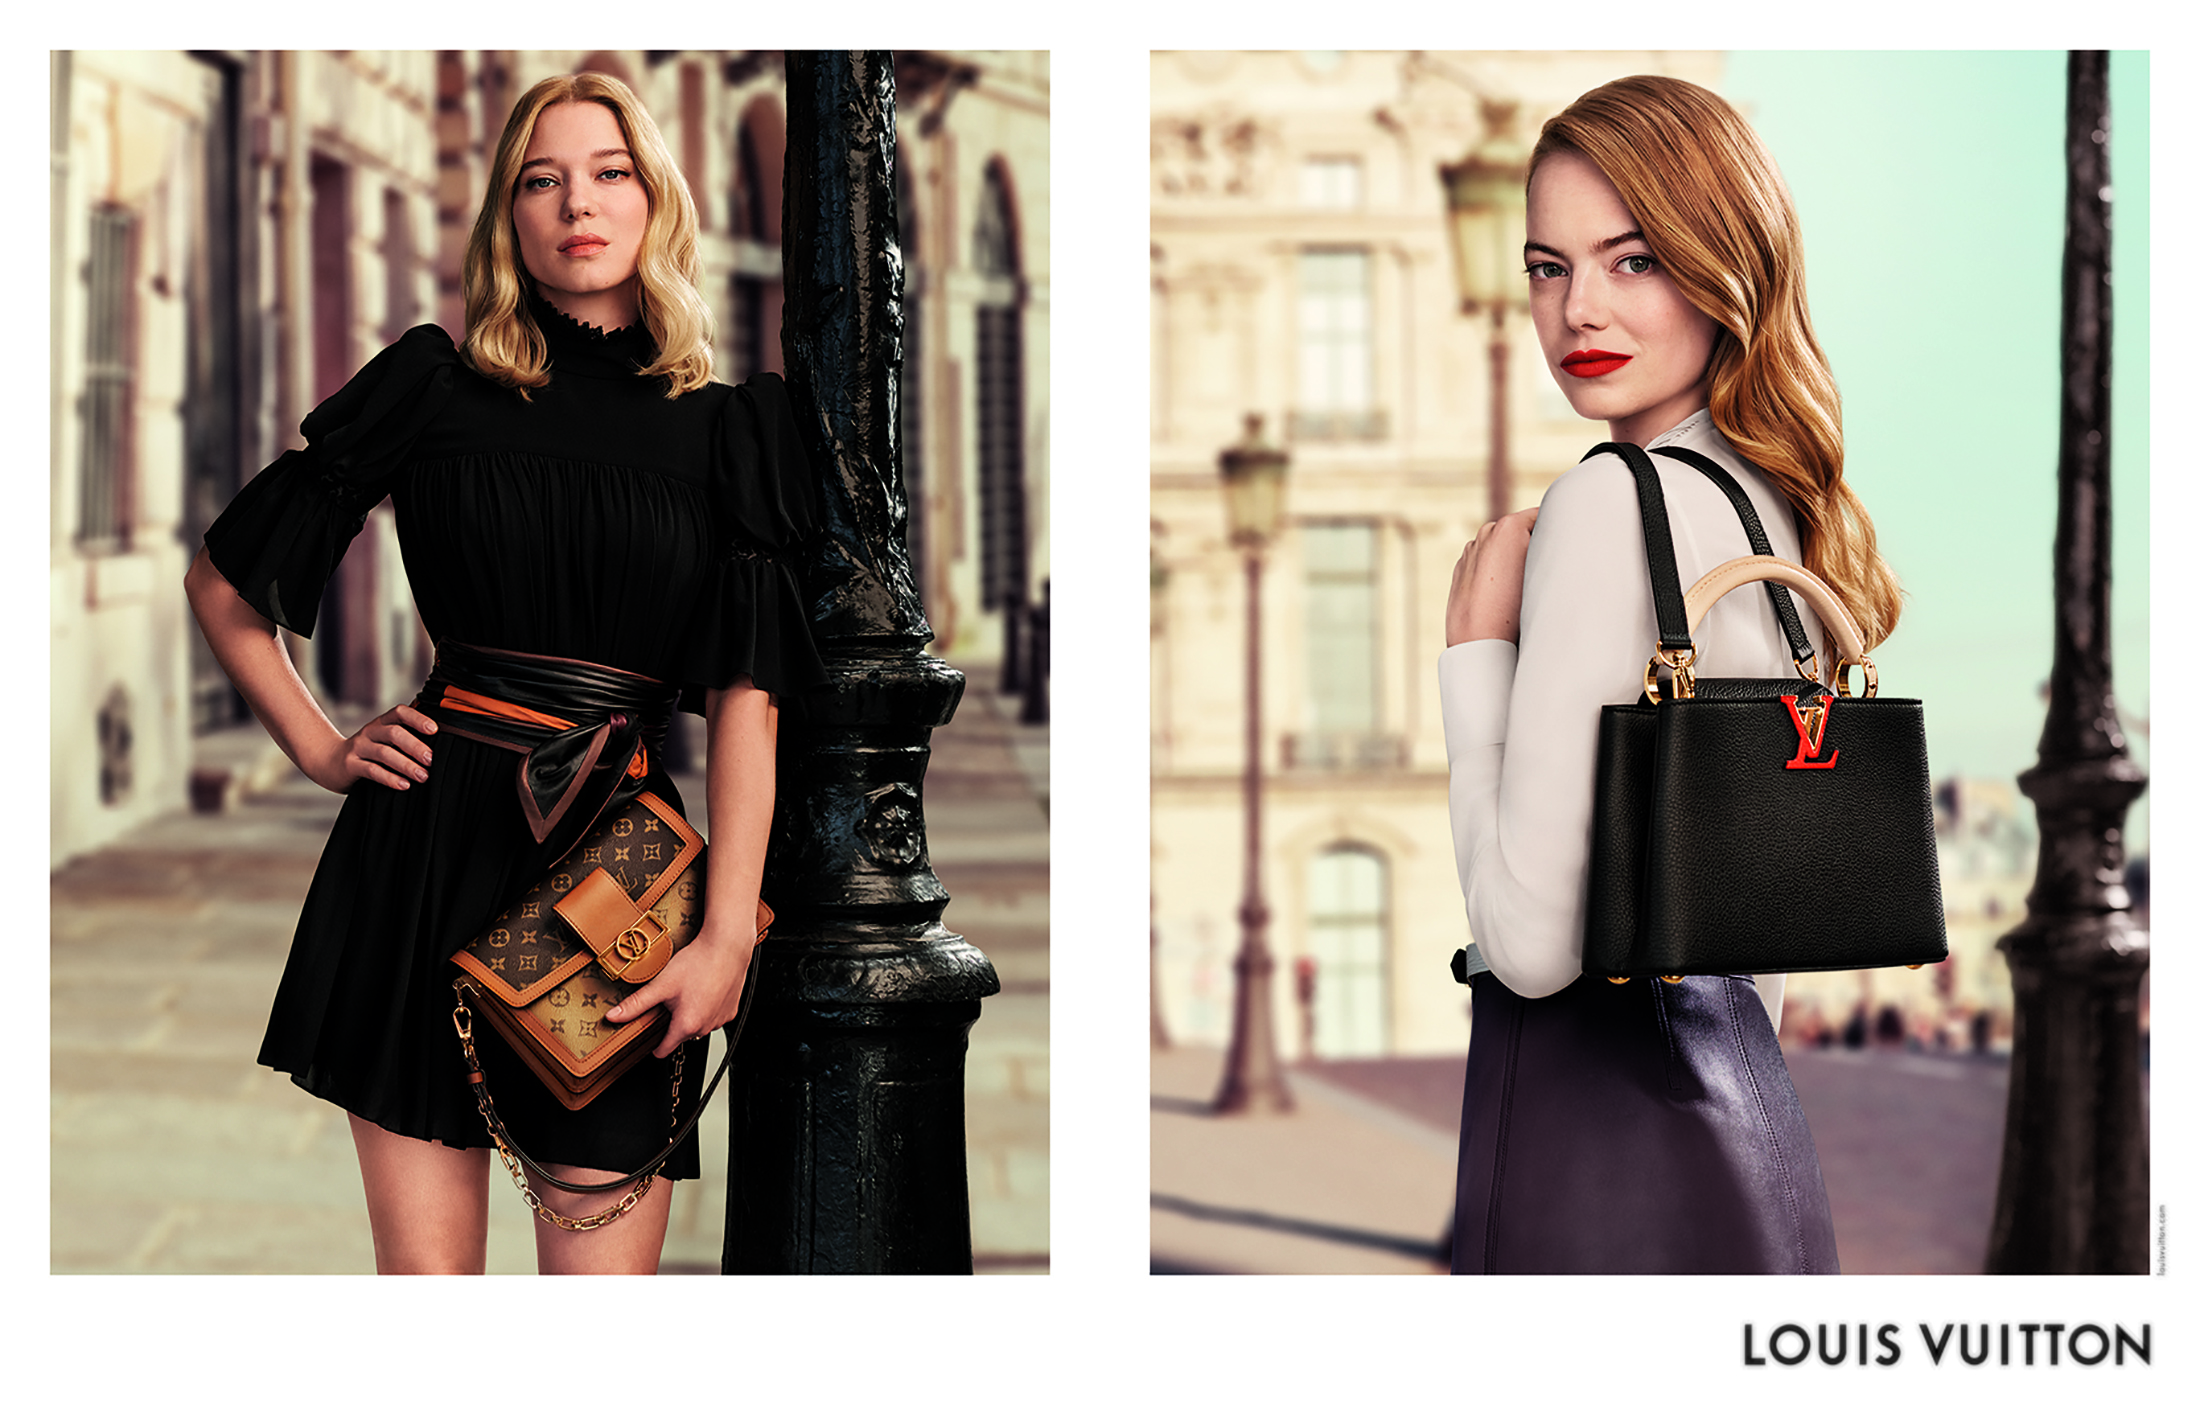 Louis Vuitton Leathergoods 'New Classics' Spring 2020 Fashion Ad Campaign Photos